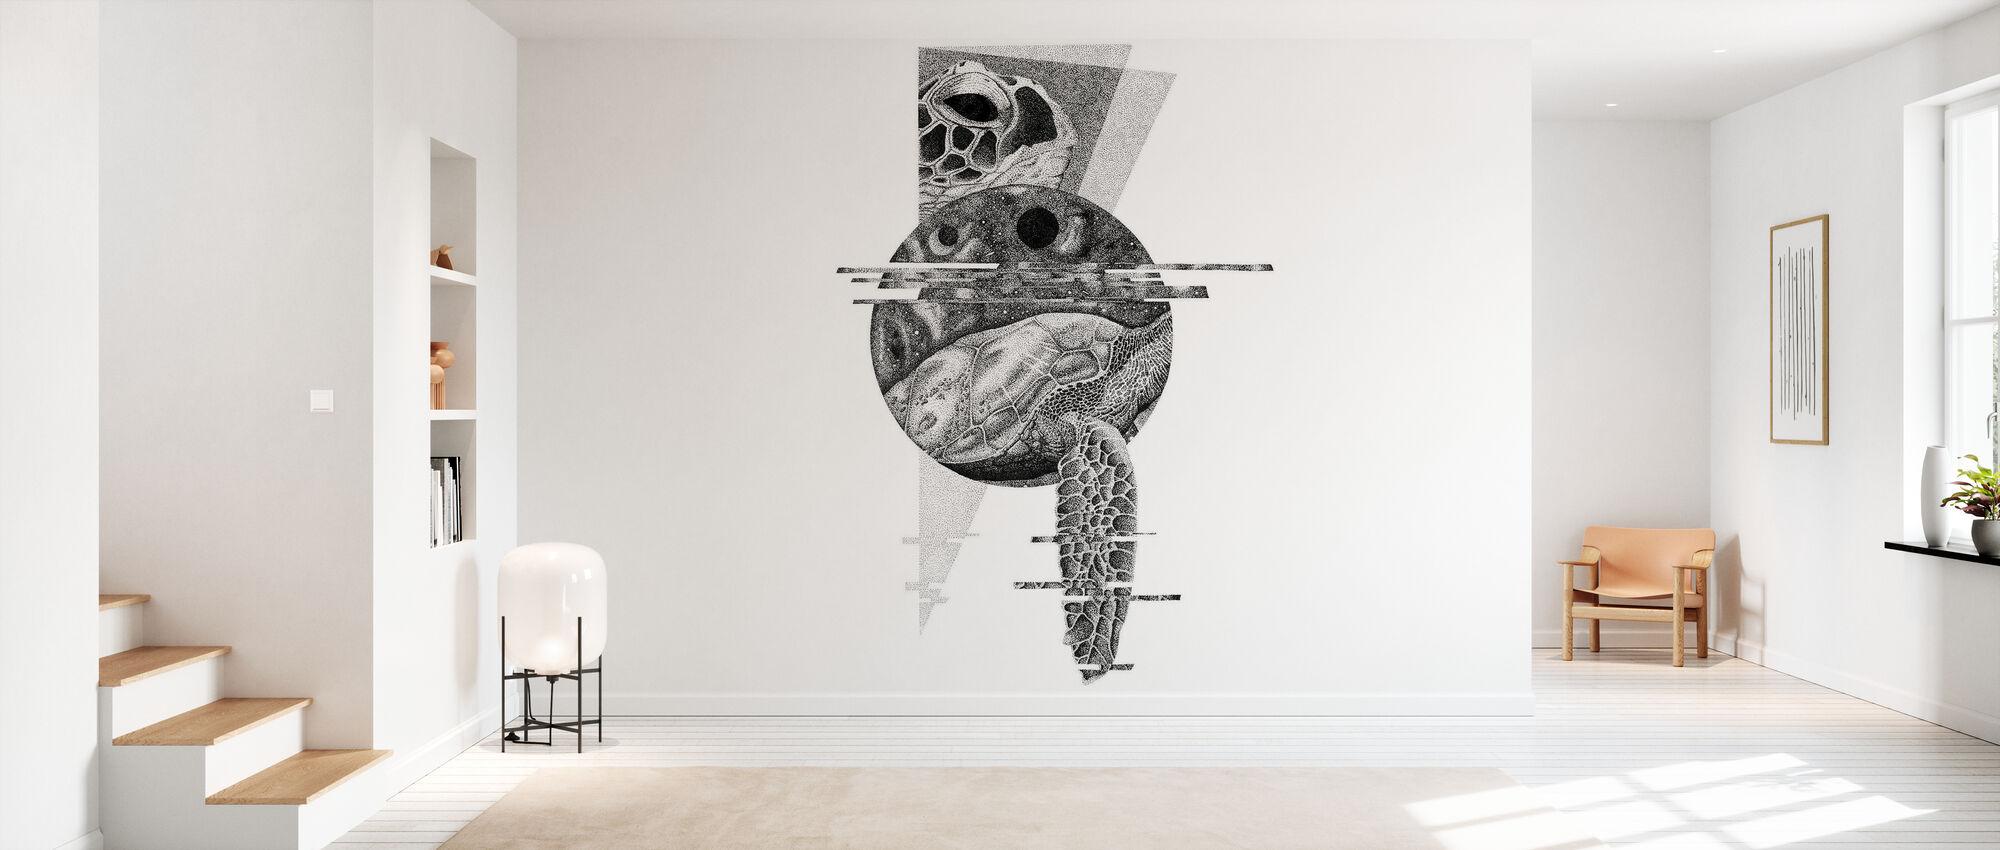 Interrupted Universe II - Wallpaper - Hallway